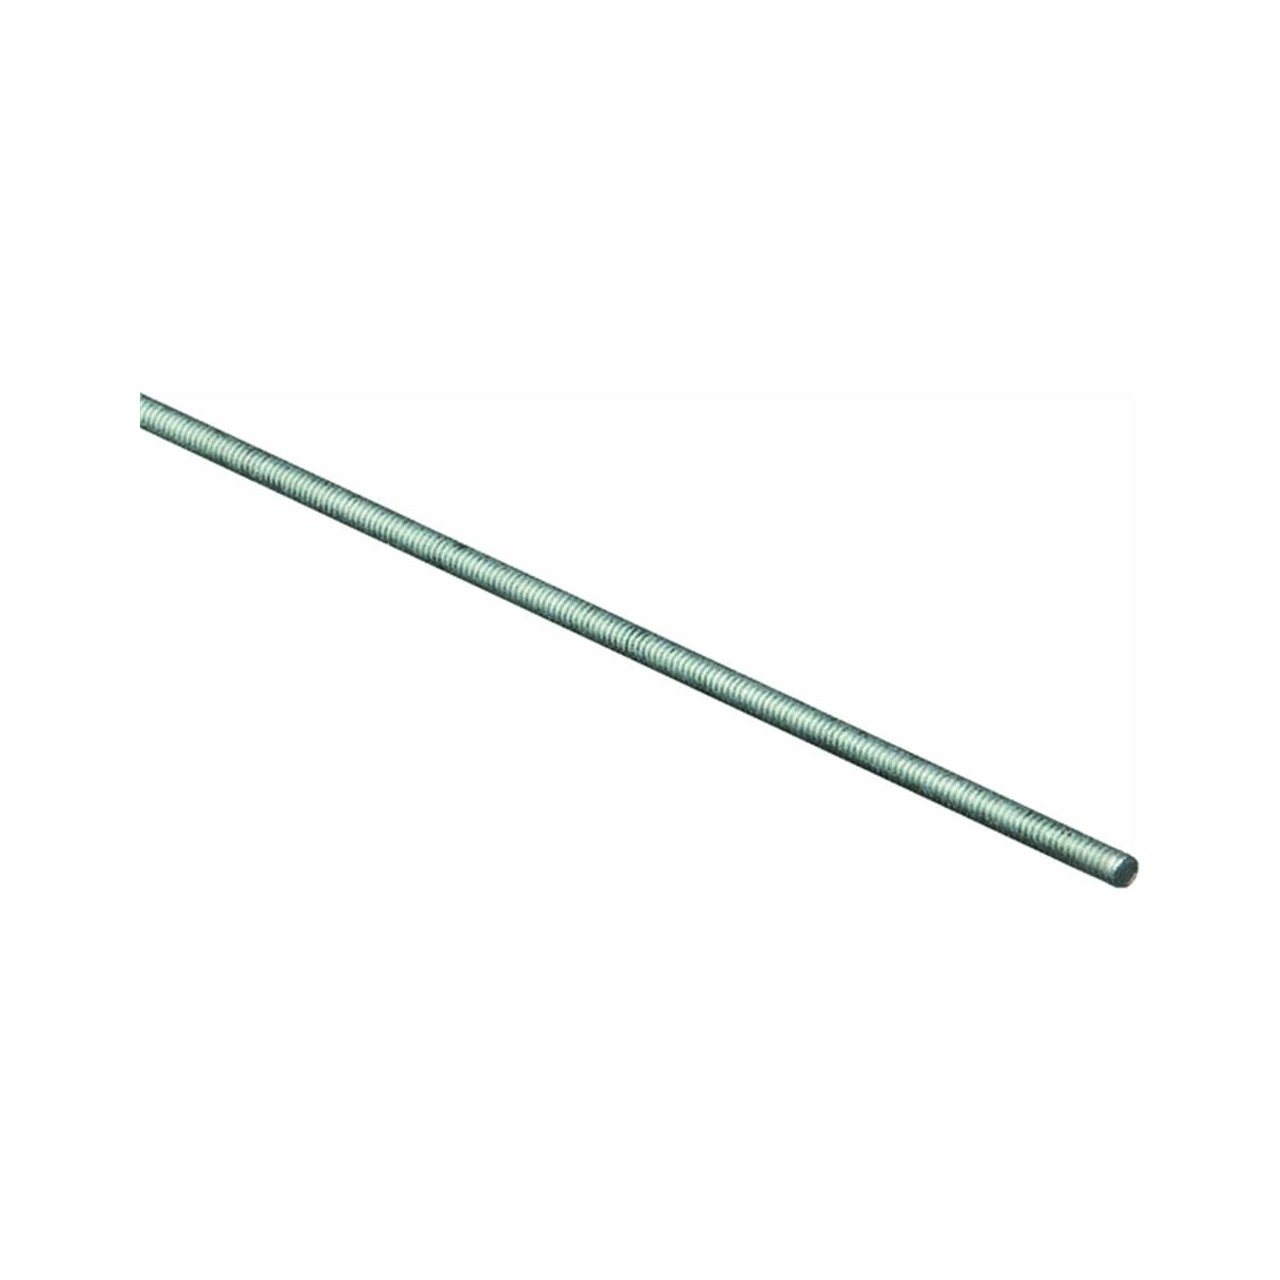 Zinc Plated 3//8-24 X 3 Ft Stanley N218-297 Threaded Rod Steel